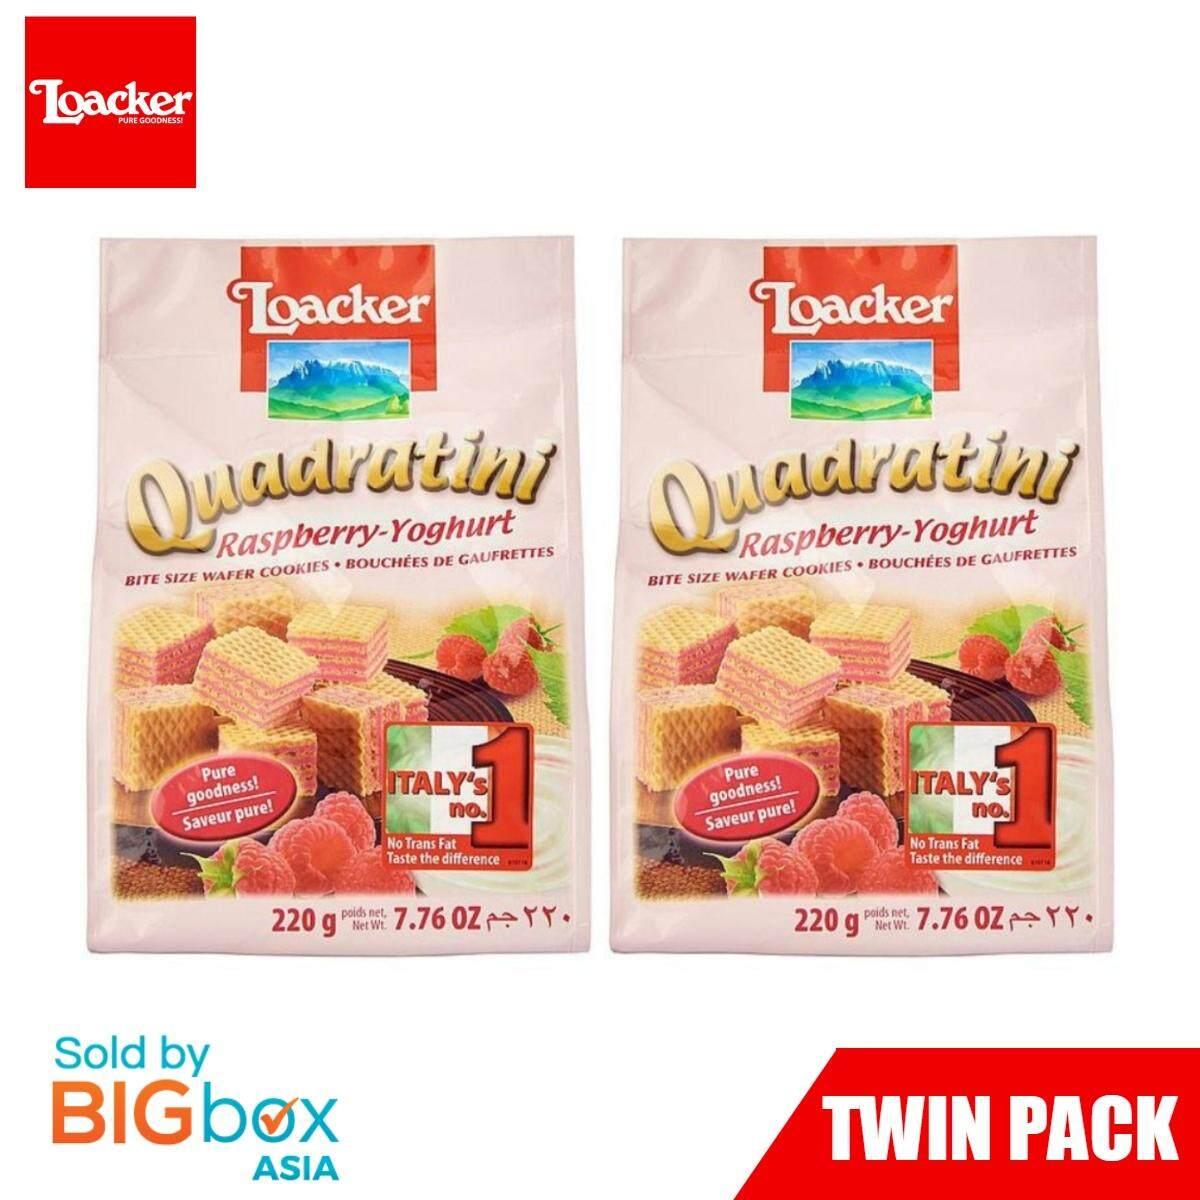 [BUNDLE 2] Loacker Quadratini 2 x 220g - Raspberry Yogurt